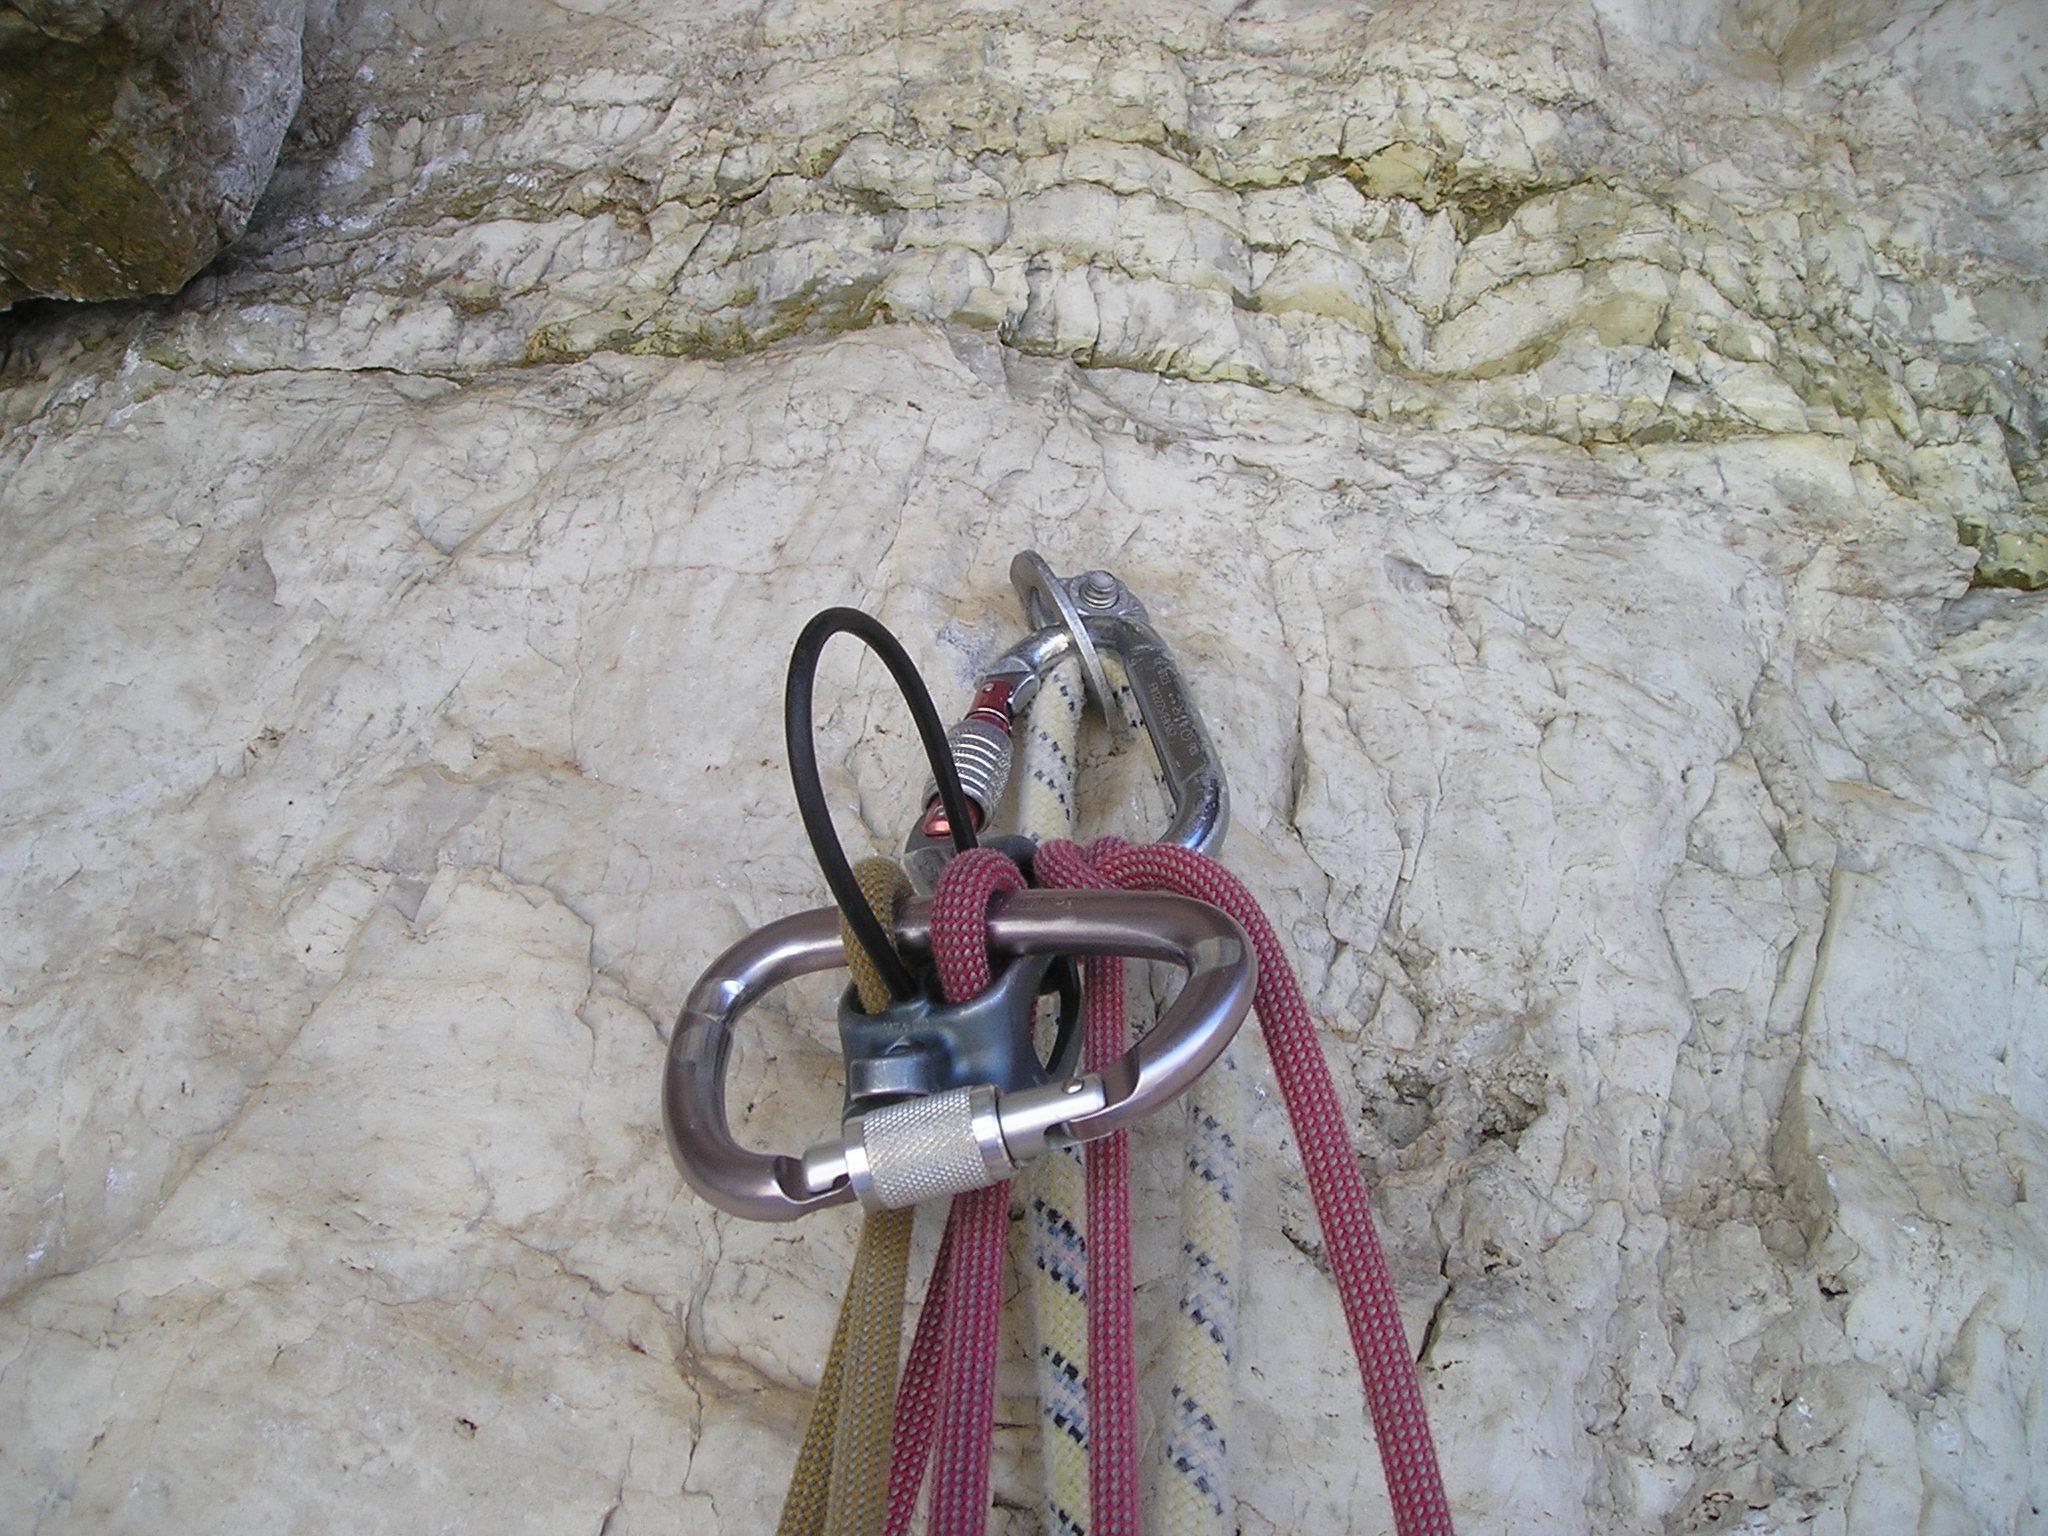 Klettergurt Zum Abseilen : Via ferrata klettersteig abseilen apacampa